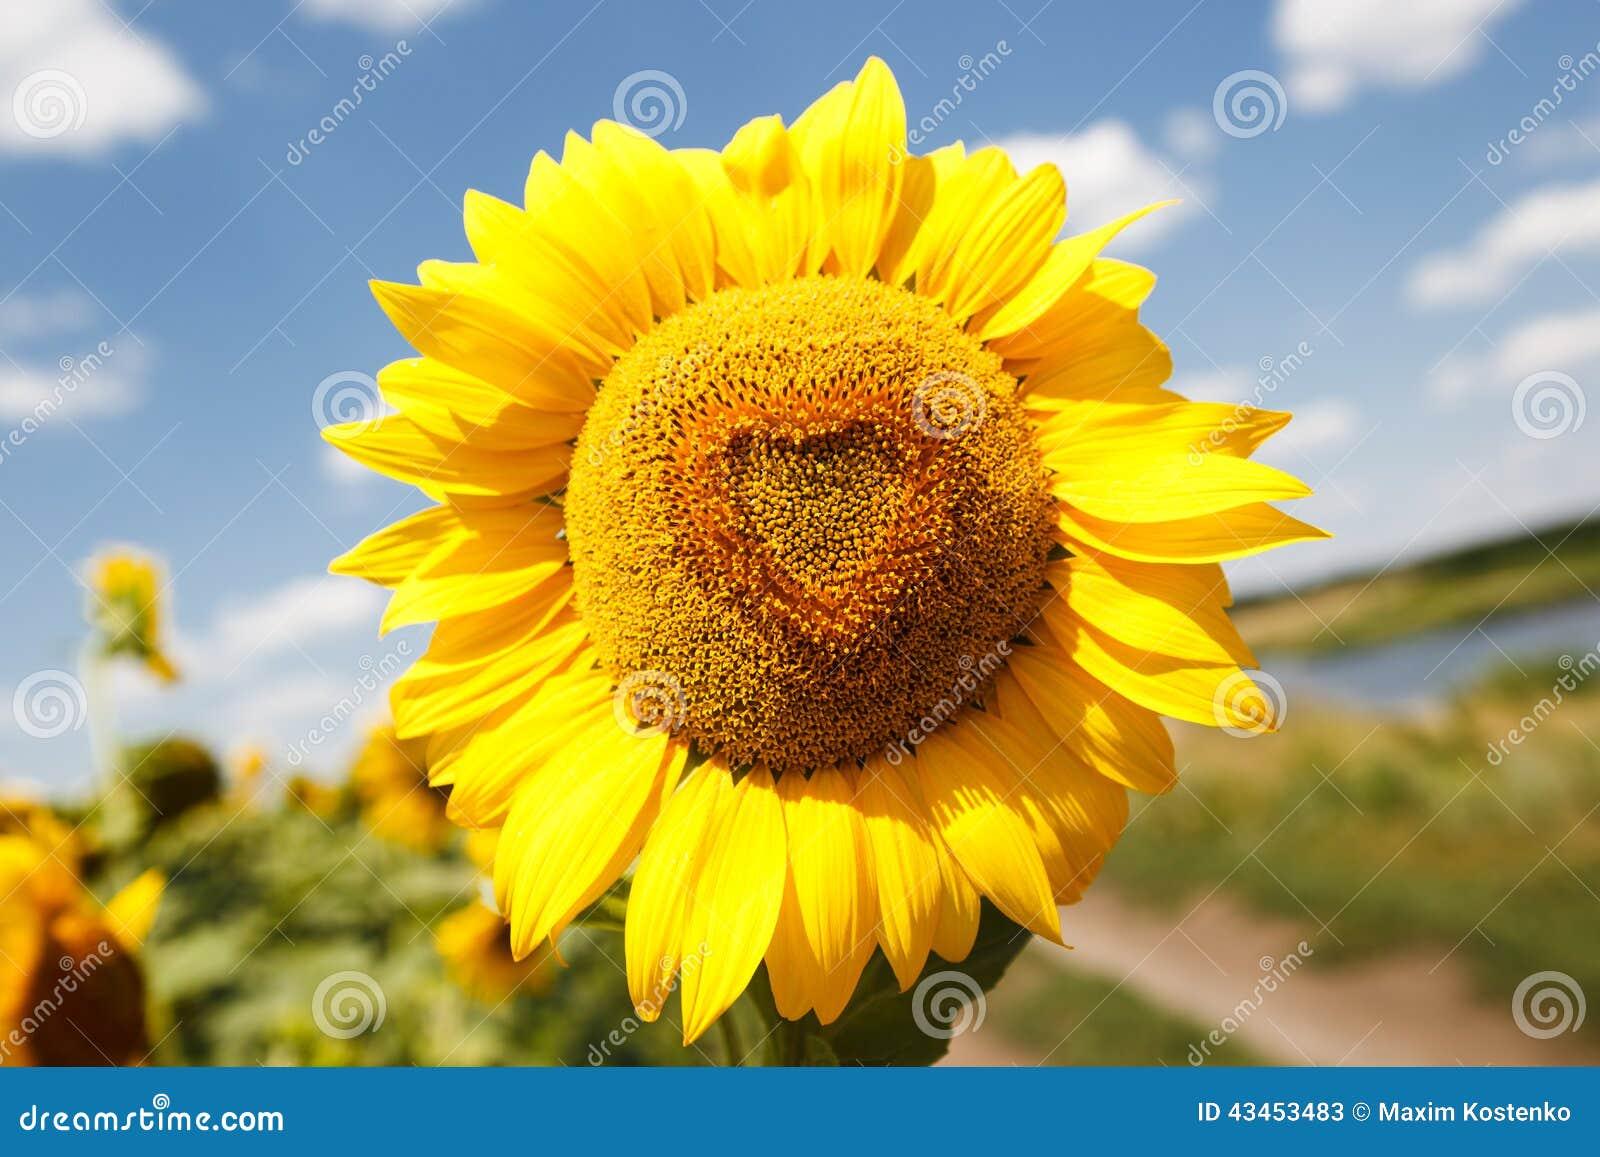 Heart Shaped Sunflower Stock Image. Image Of Season, Heart